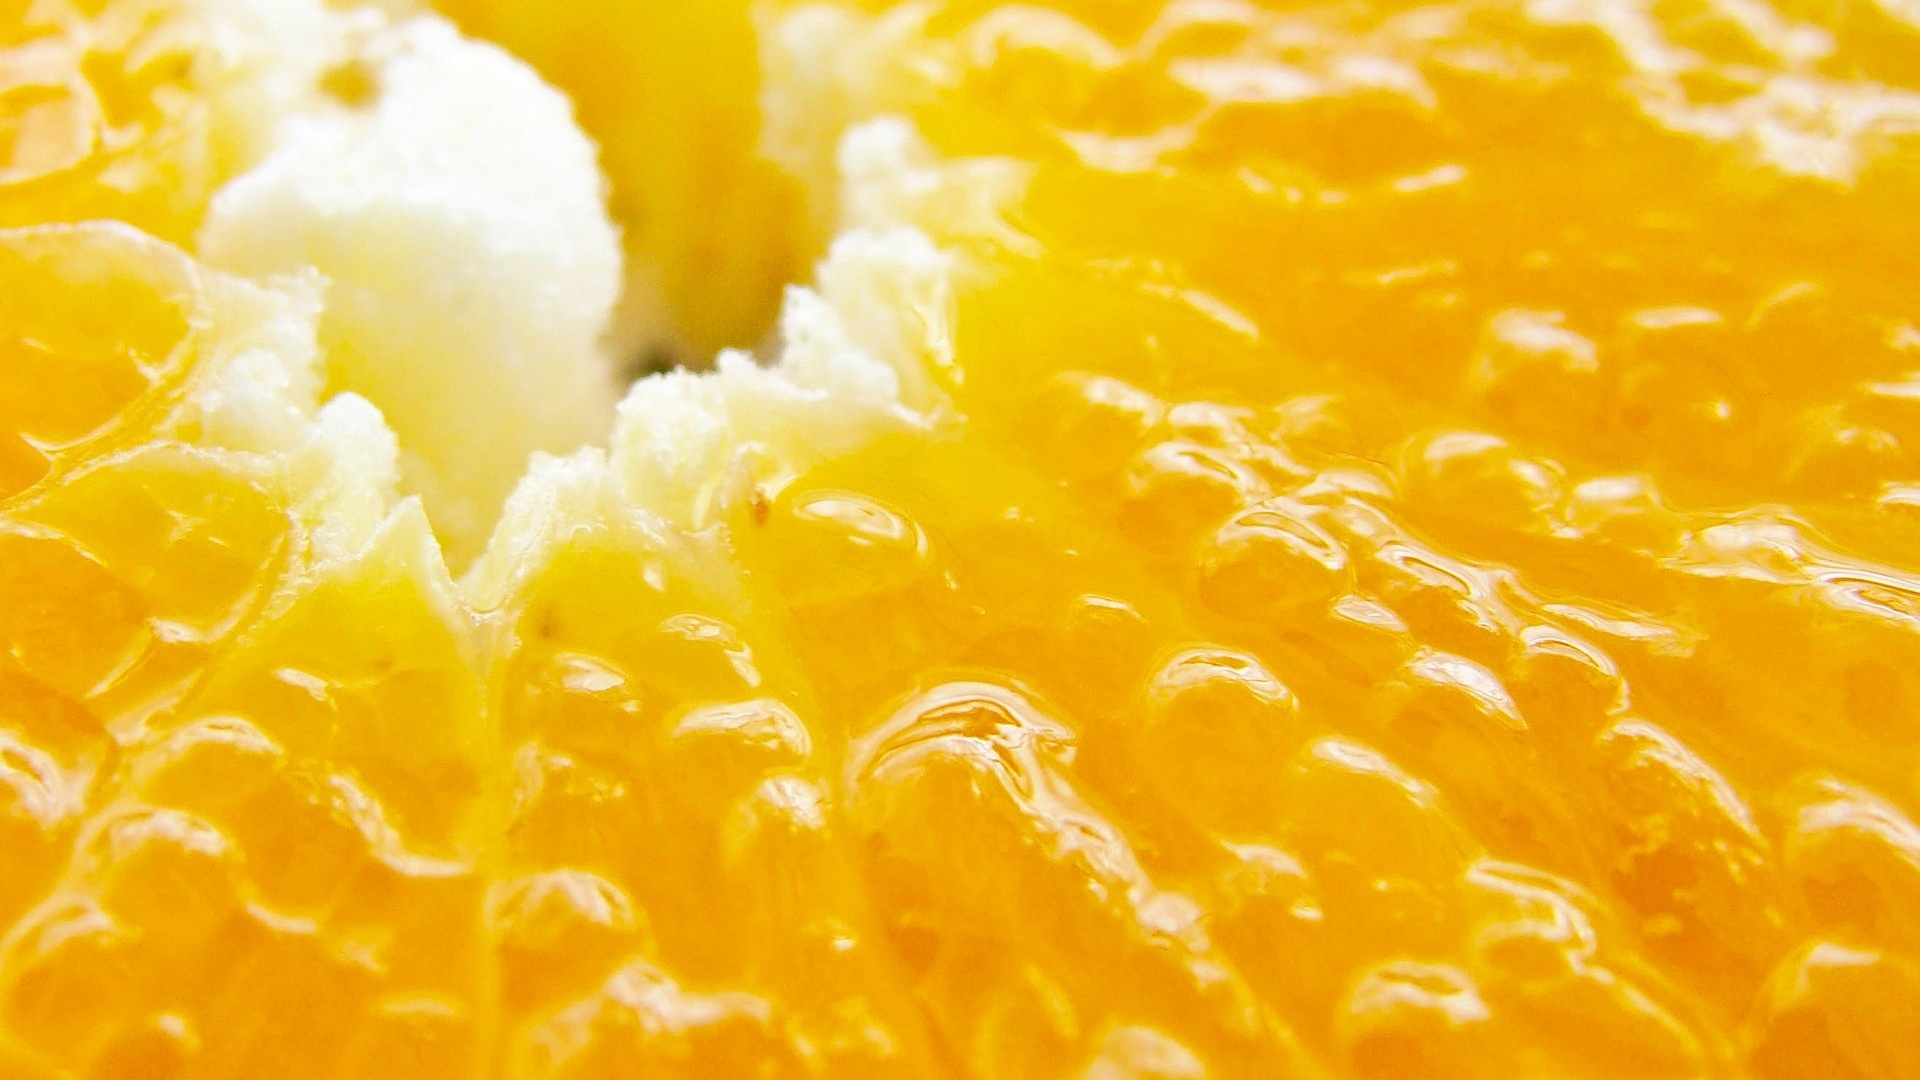 Orange Macro Pictures